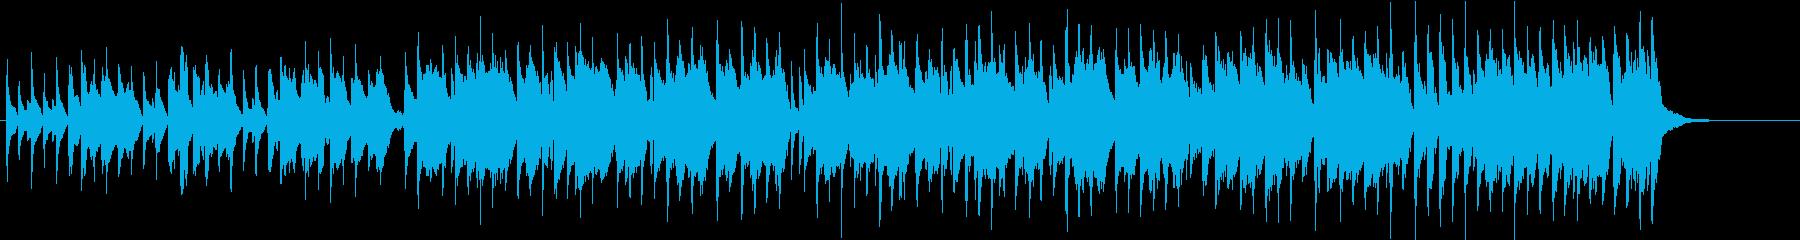 CM用10B、陽気で可愛いキッズ・ペットの再生済みの波形